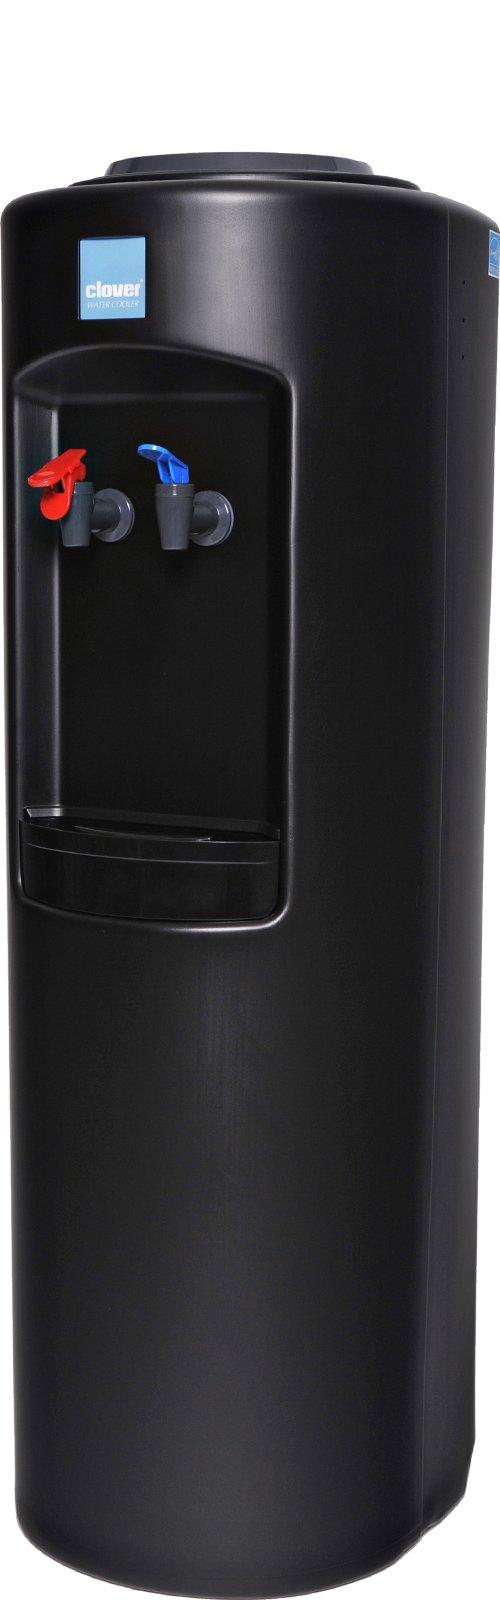 Clover B7a Hot And Cold Bottled Water Dispenser Black